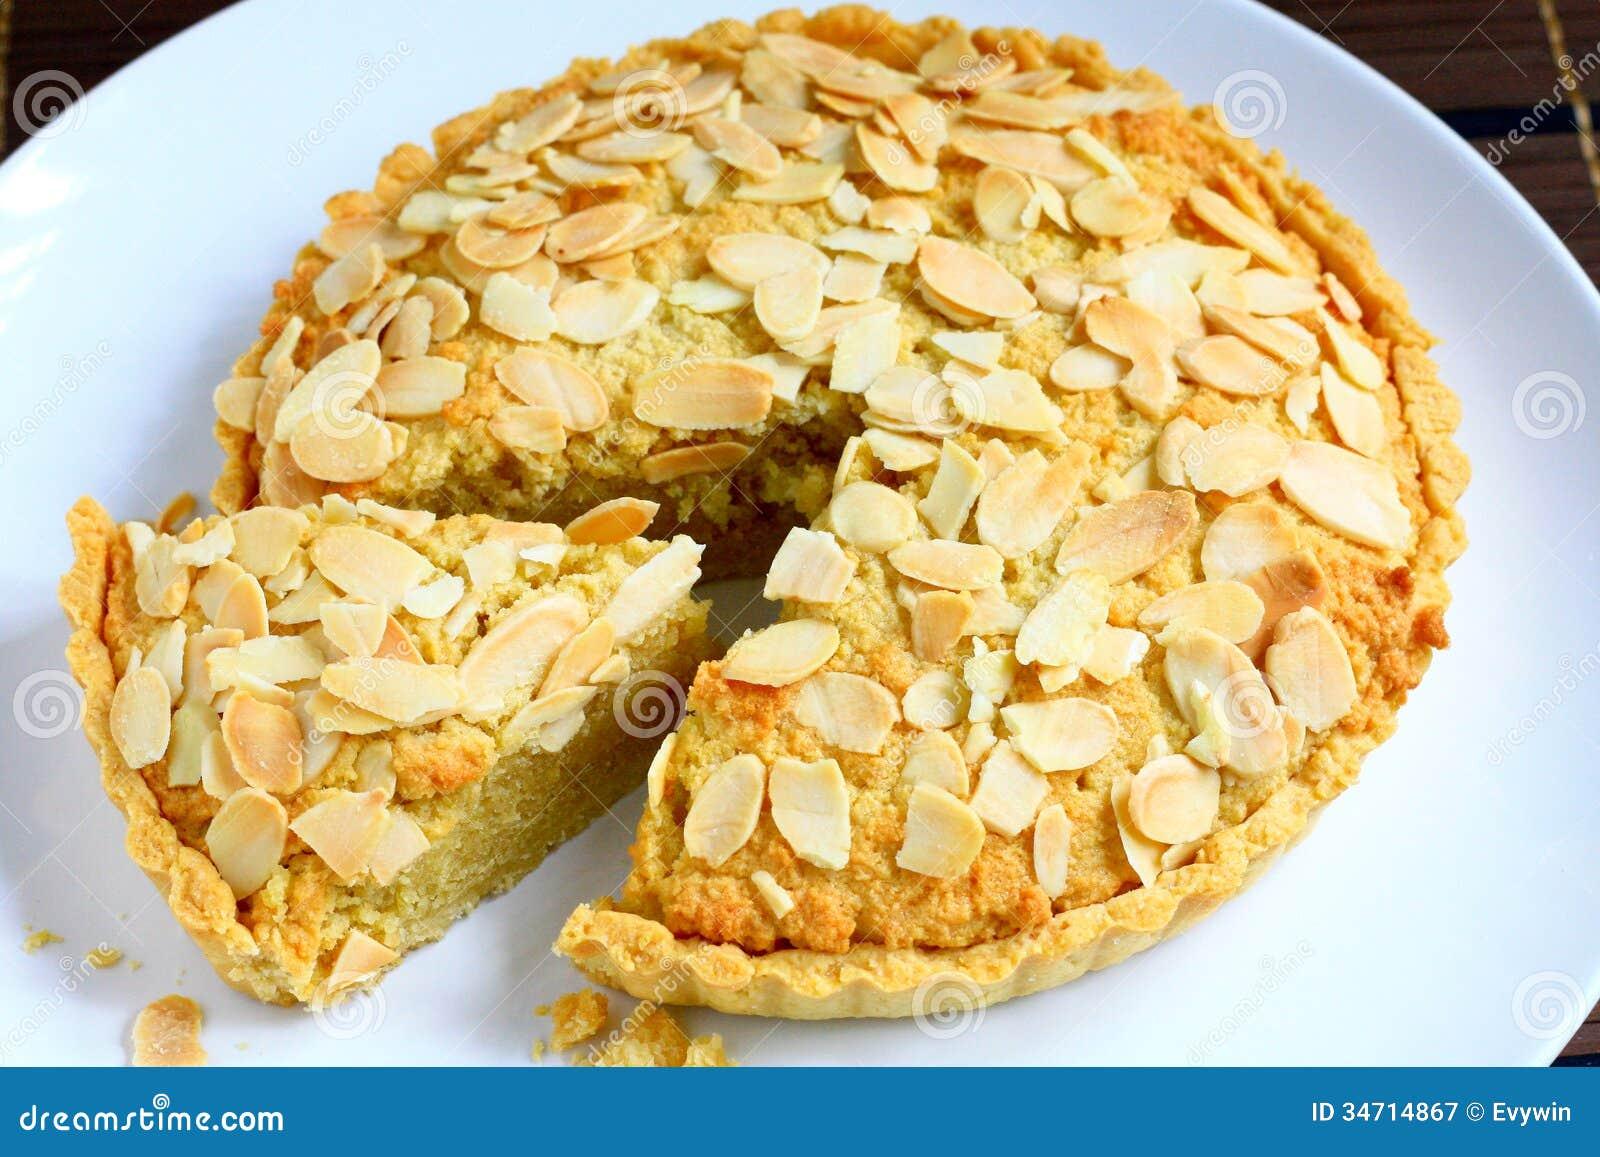 Almond Tart Royalty Free Stock Photography - Image: 34714867 Almondy Taart Glutenvrij